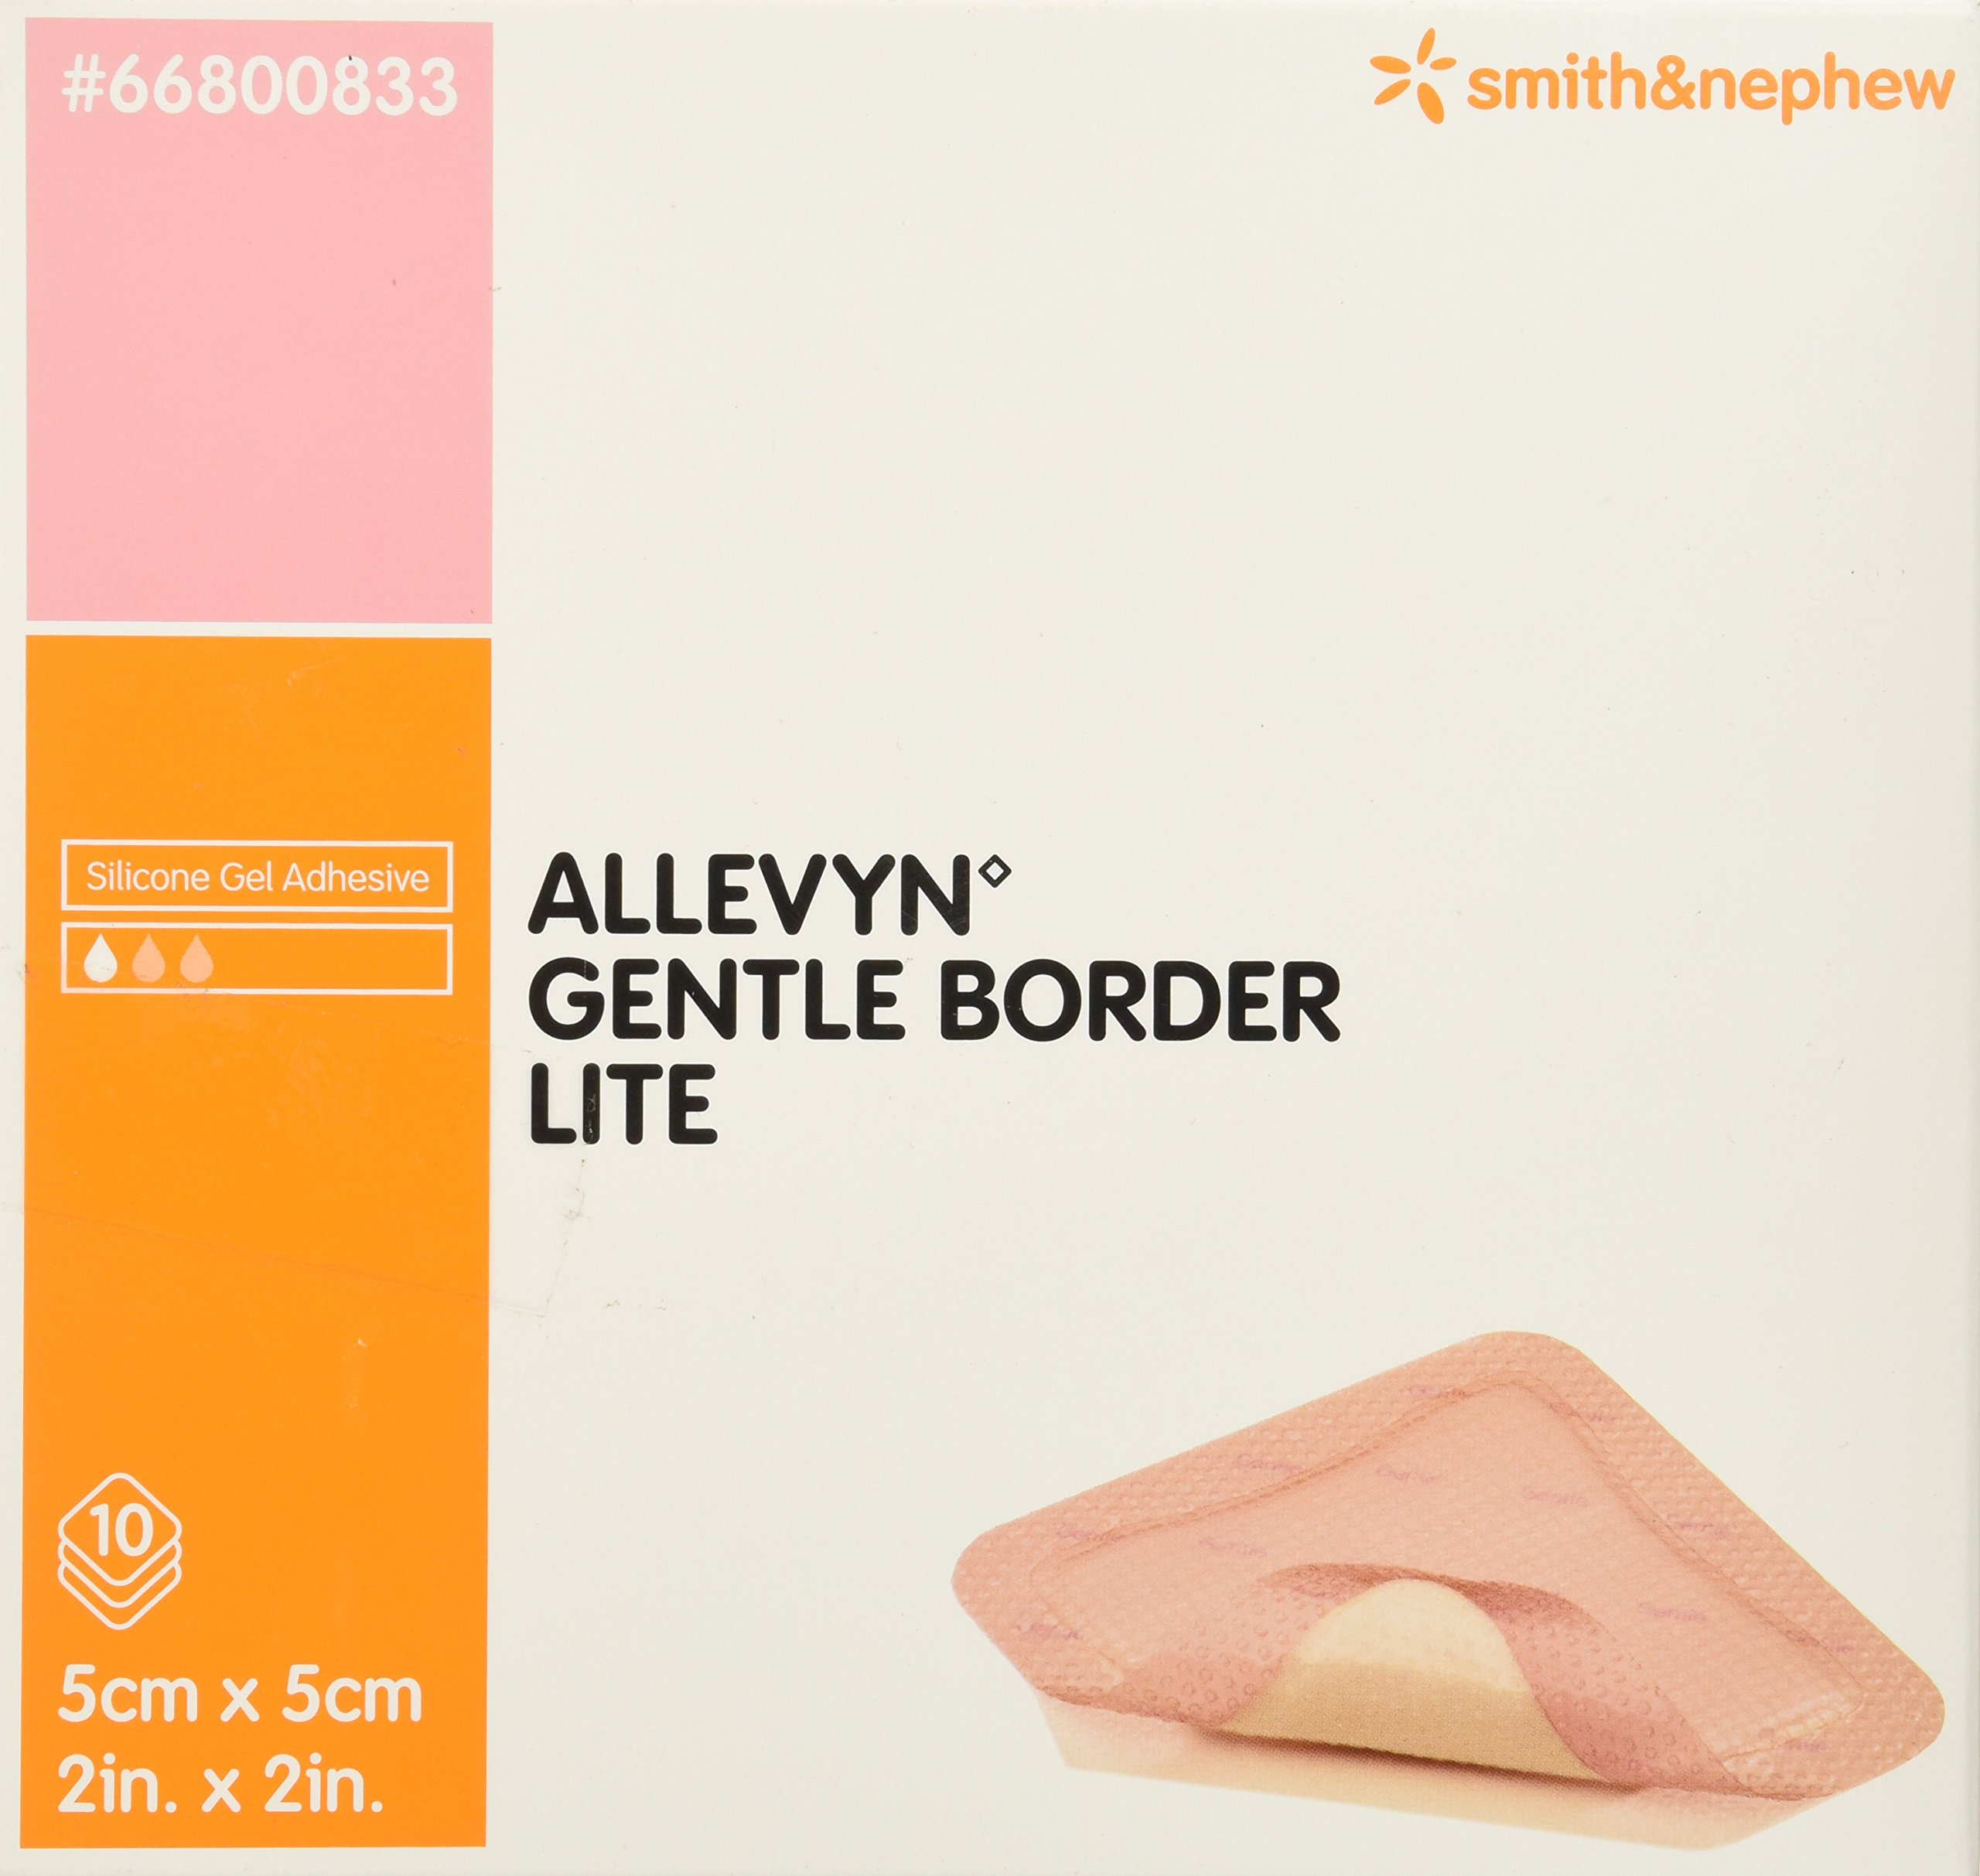 Smith & Nephew Foam Dressing Allevyn Gentle Border Lite 2 X 2 Inch Square Adhesive Sterile #66800833, Box of 10